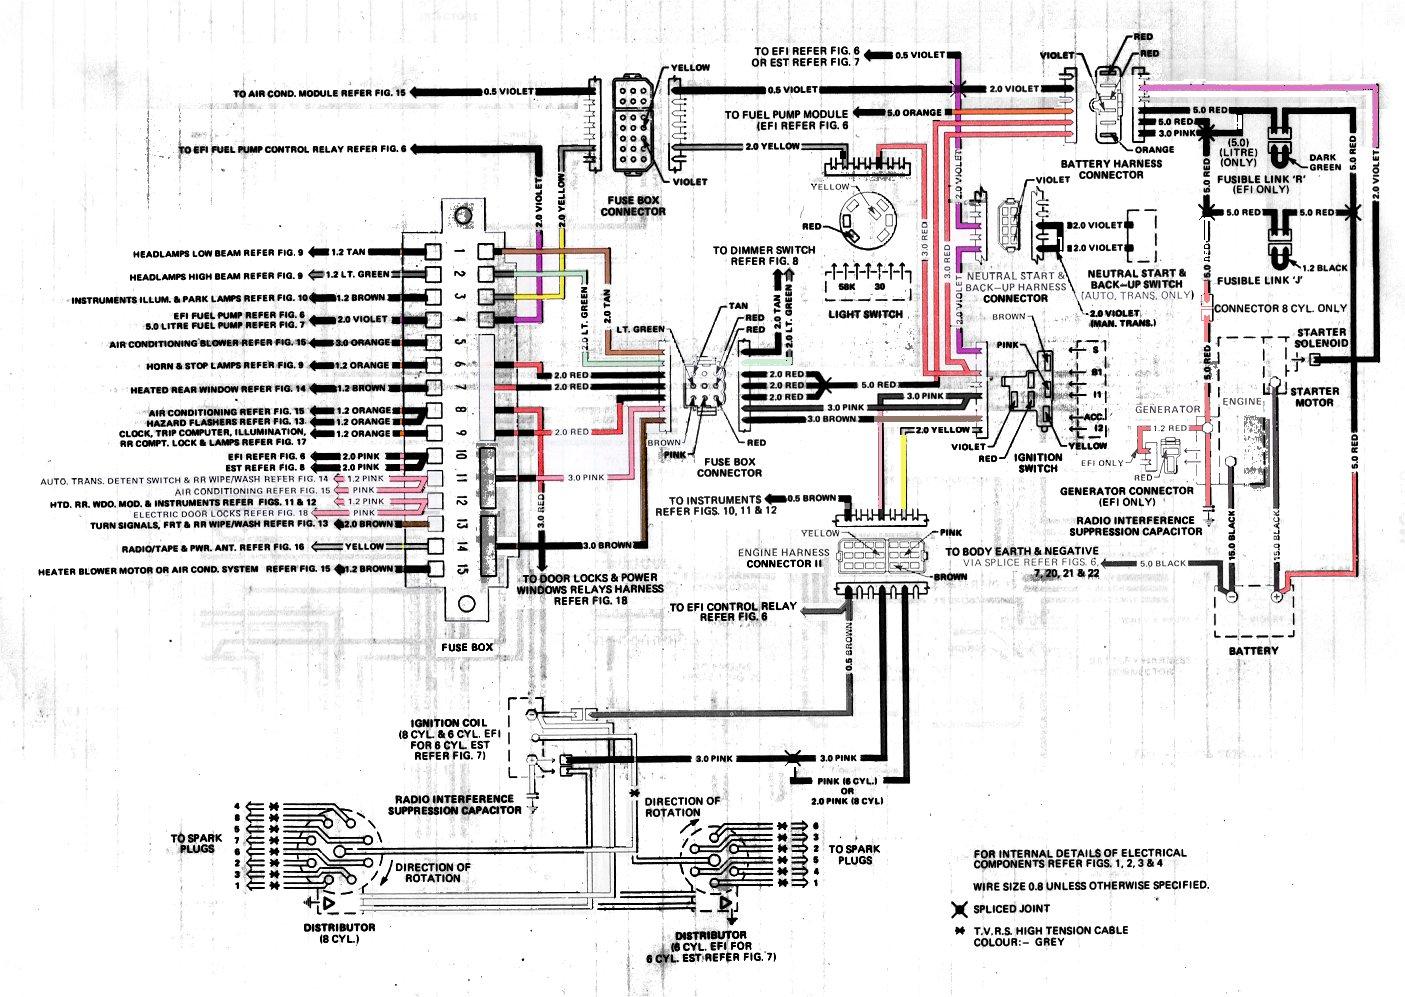 Suzuki rf 900 service manual – Manuals Liry for free on custom motorcycle wiring diagrams, suzuki 125 atv diagrams, suzuki motorcycle battery, suzuki s&p 400 wiring, suzuki wiring-diagram 125 h, suzuki gs550 wiring diagram, suzuki 700 1994 wiring-diagram, suzuki parts diagram, suzuki gsxr 750 wiring diagram, big dog motorcycle wiring diagrams, suzuki motorcycles 72 duster, suzuki motorcycle repair, suzuki motorcycle rectifier diagram, suzuki quadrunner 125 engine, kawasaki motorcycle wiring diagrams, suzuki motorcycle sketches, suzuki motorcycle parts, suzuki motorcycle automatic transmission, suzuki ts185 wiring diagram, yamaha motorcycle wiring diagrams,